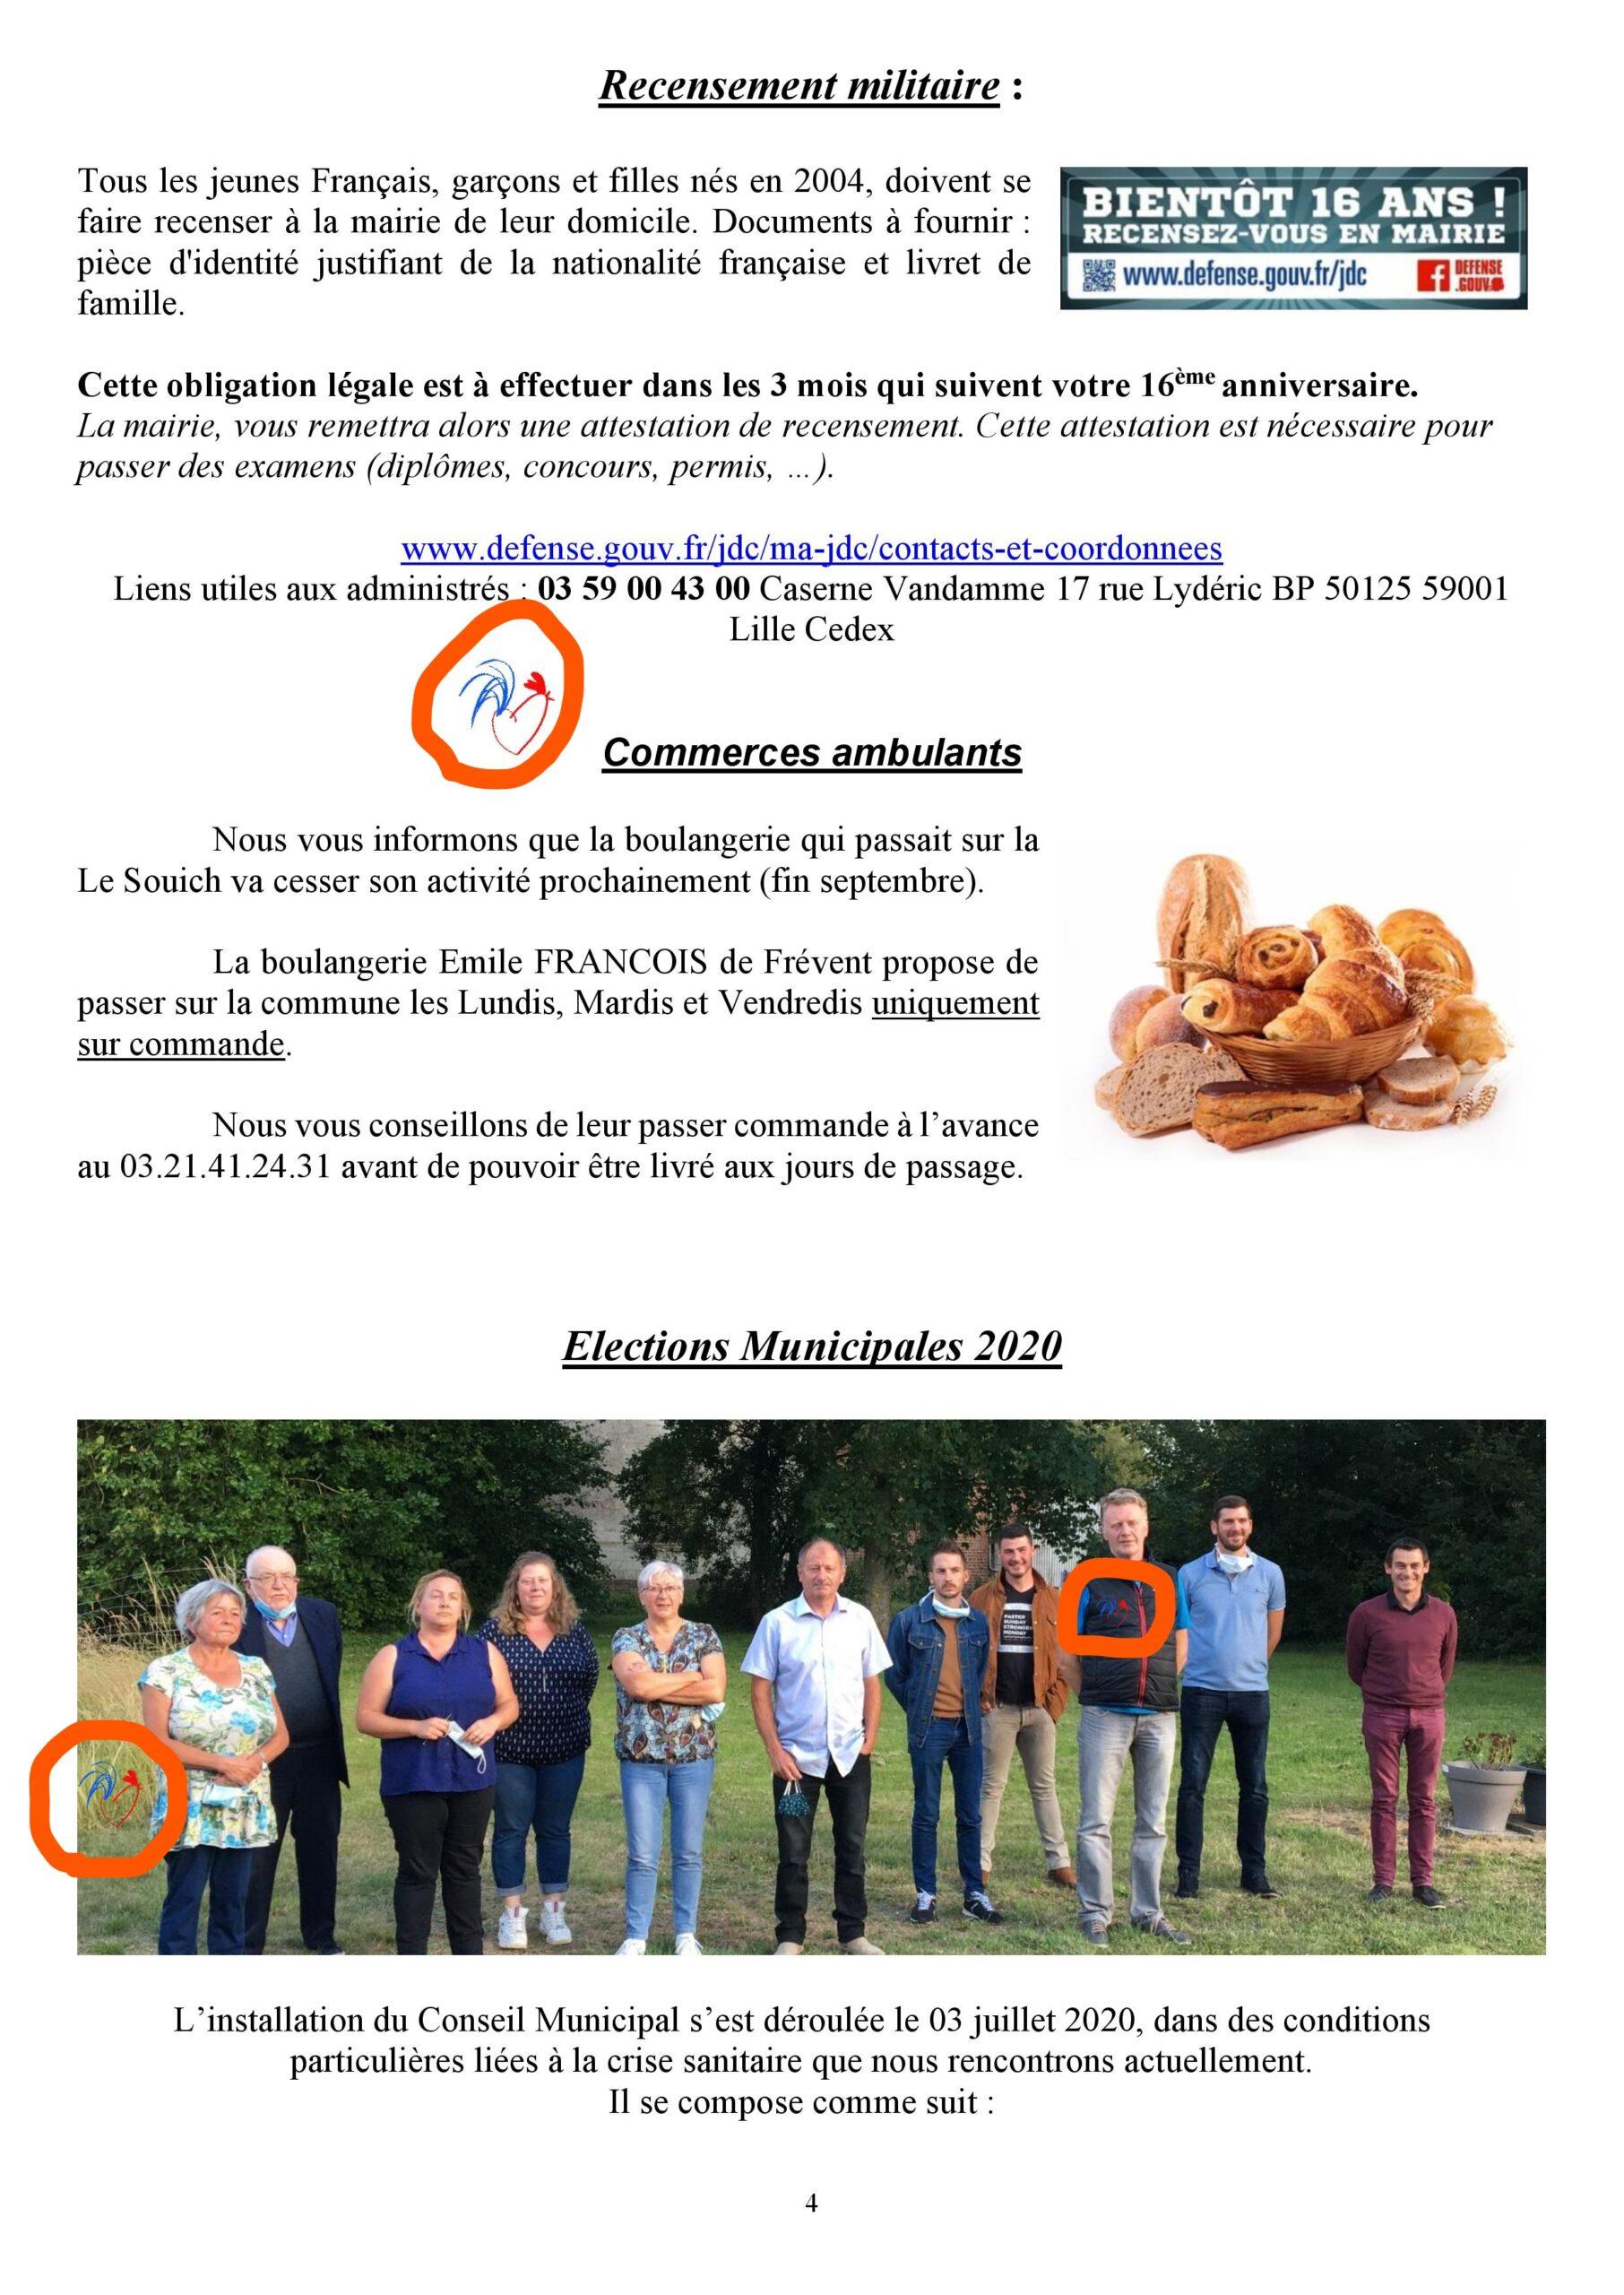 Inkedbulletin municipal septembre 2020-page-004_LI